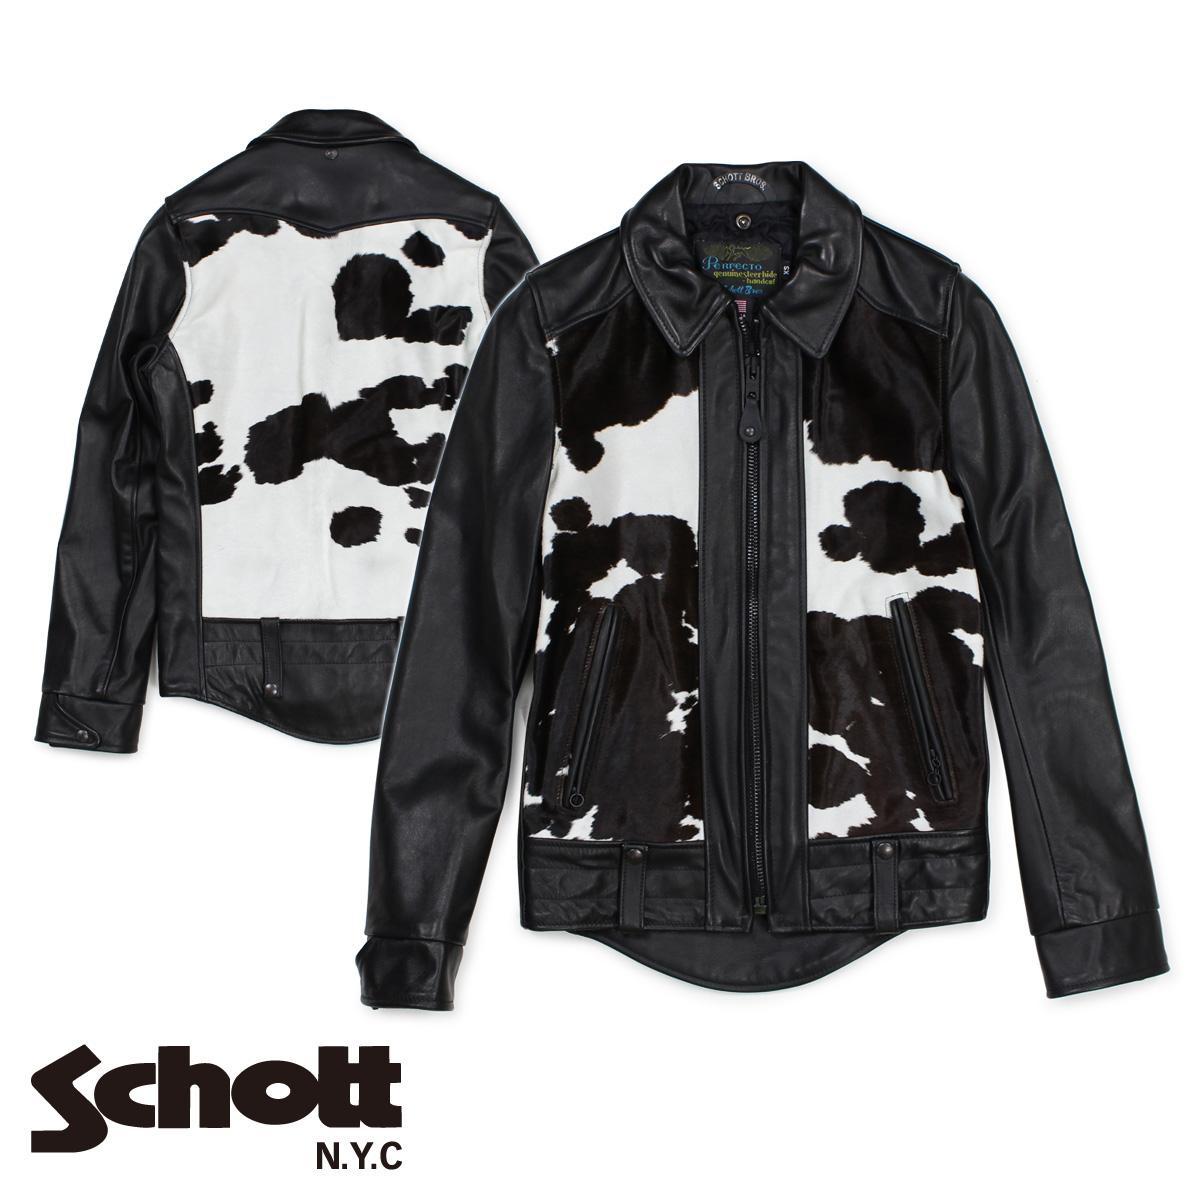 Schott EL CAMINO 50S WEST COAST BIKER JACKET ショット ライダースジャケット ジャケット レザージャケット メンズ ブラック P6422